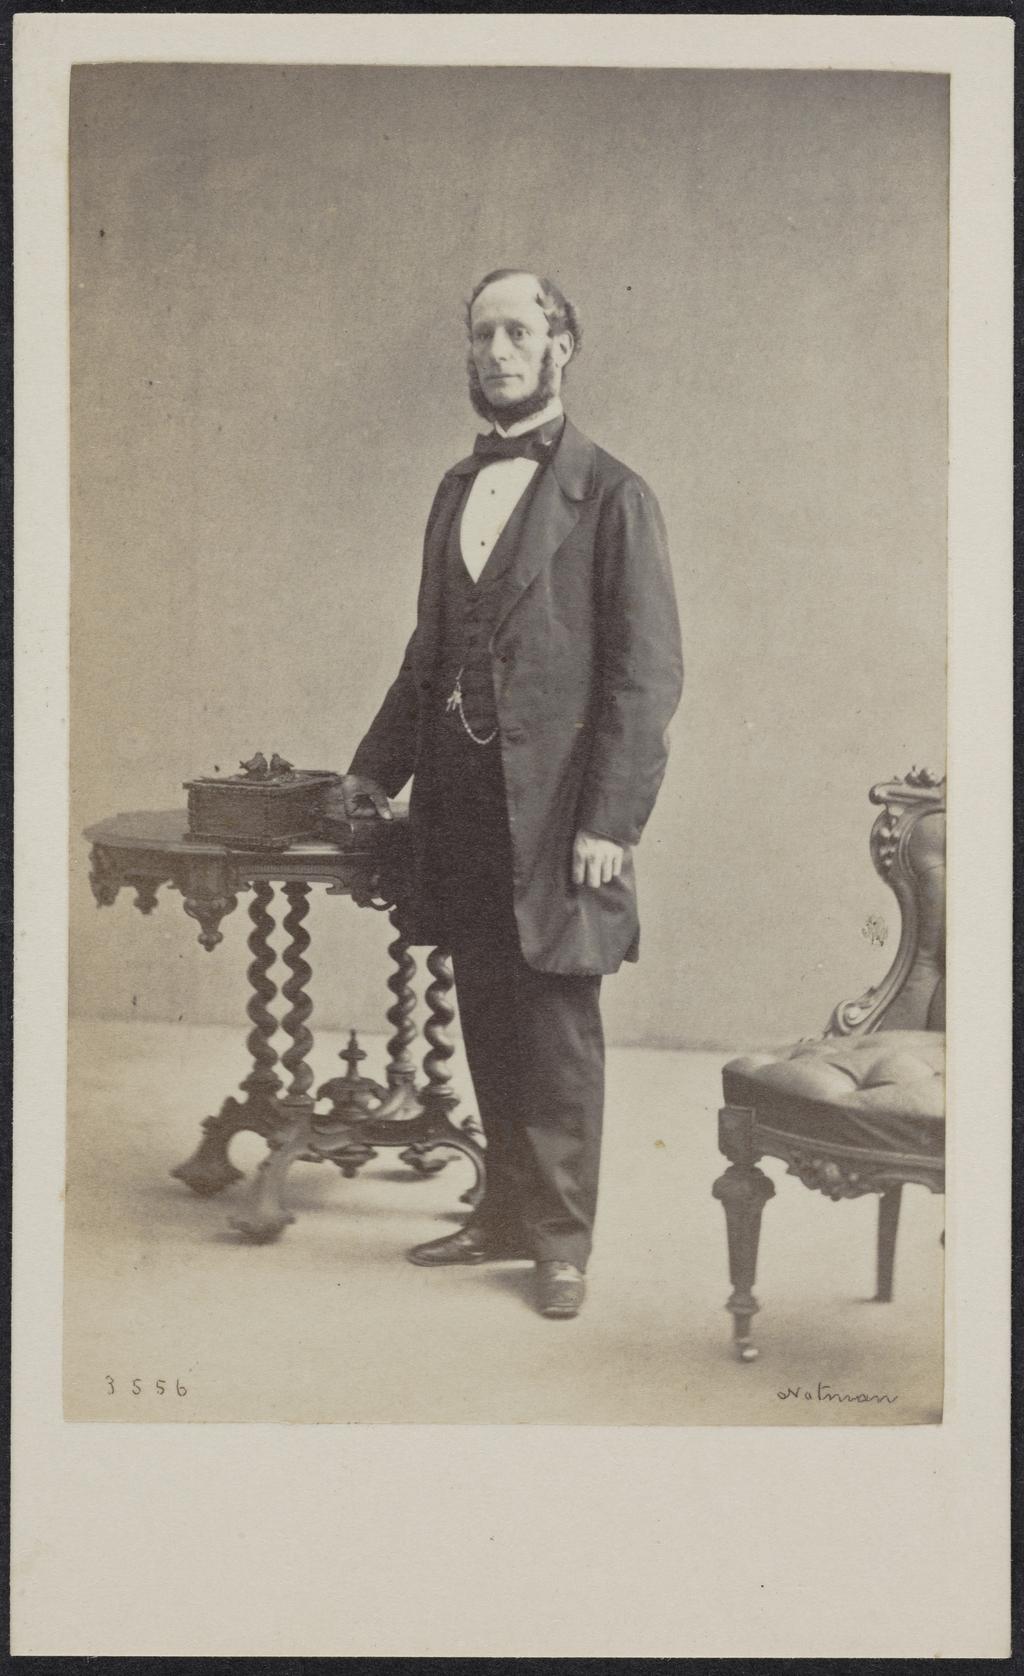 Robert M. Julyan, de l'album de collection dit de Richard Alleyn